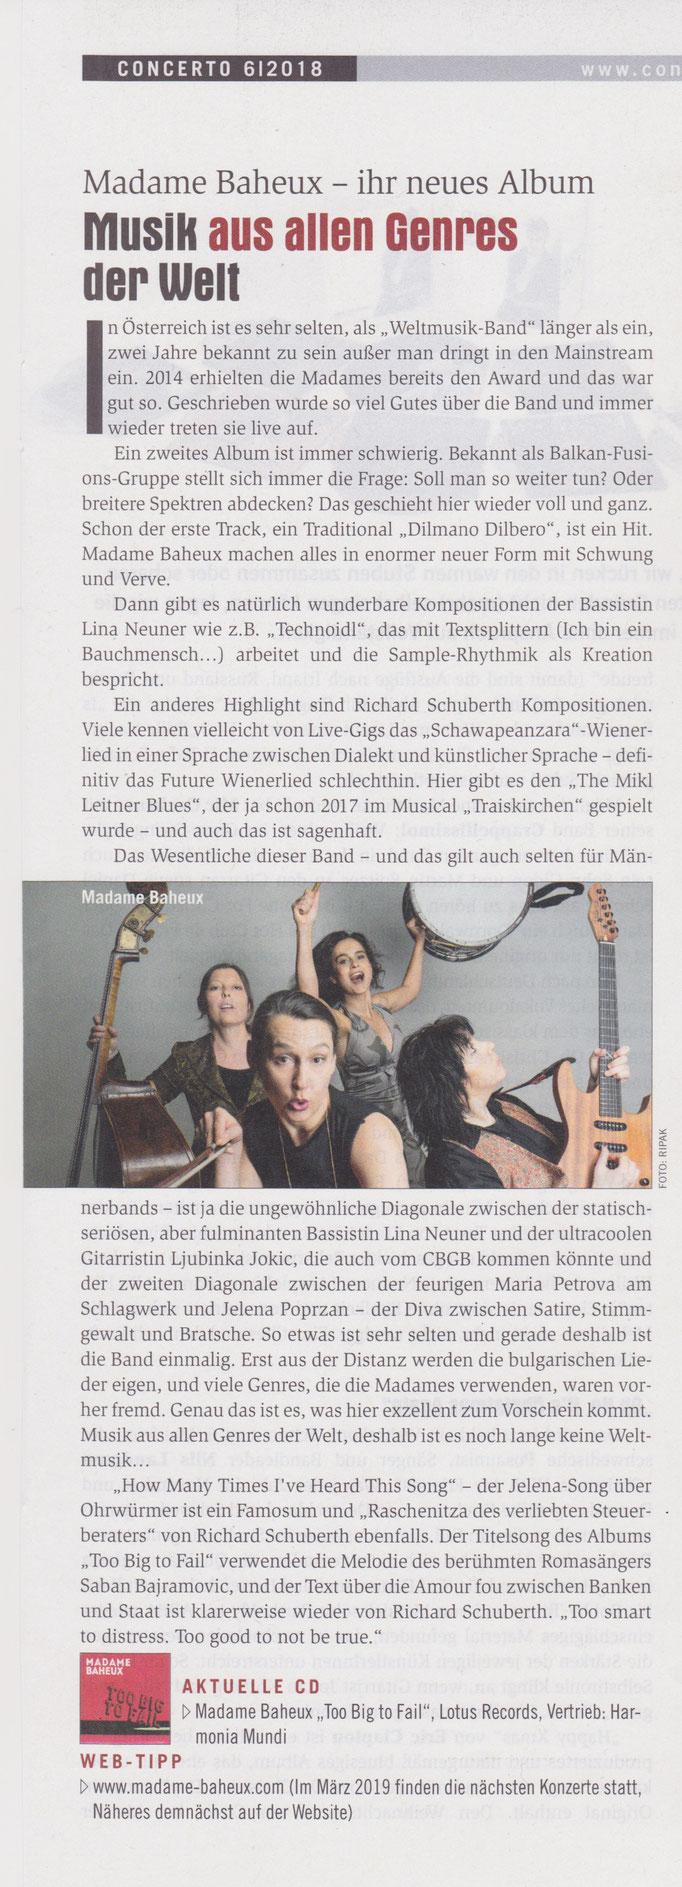 Concerto (A) 2018